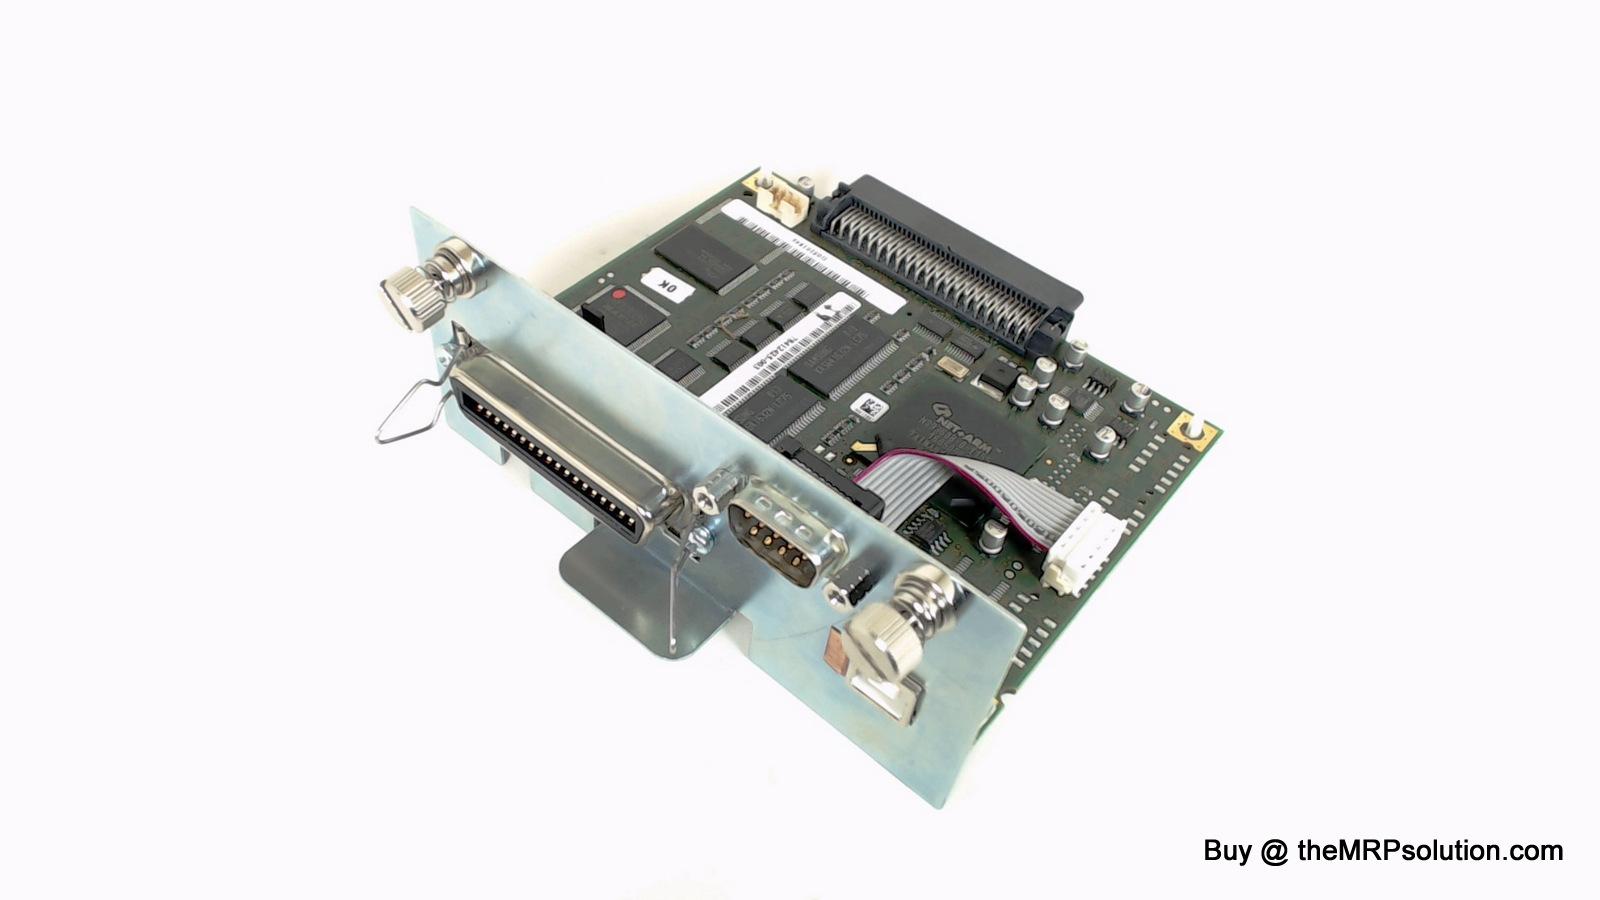 COMPUPRINT 78902568-001 CNTRL CARD, SBSC-P,S,USB Refurbished